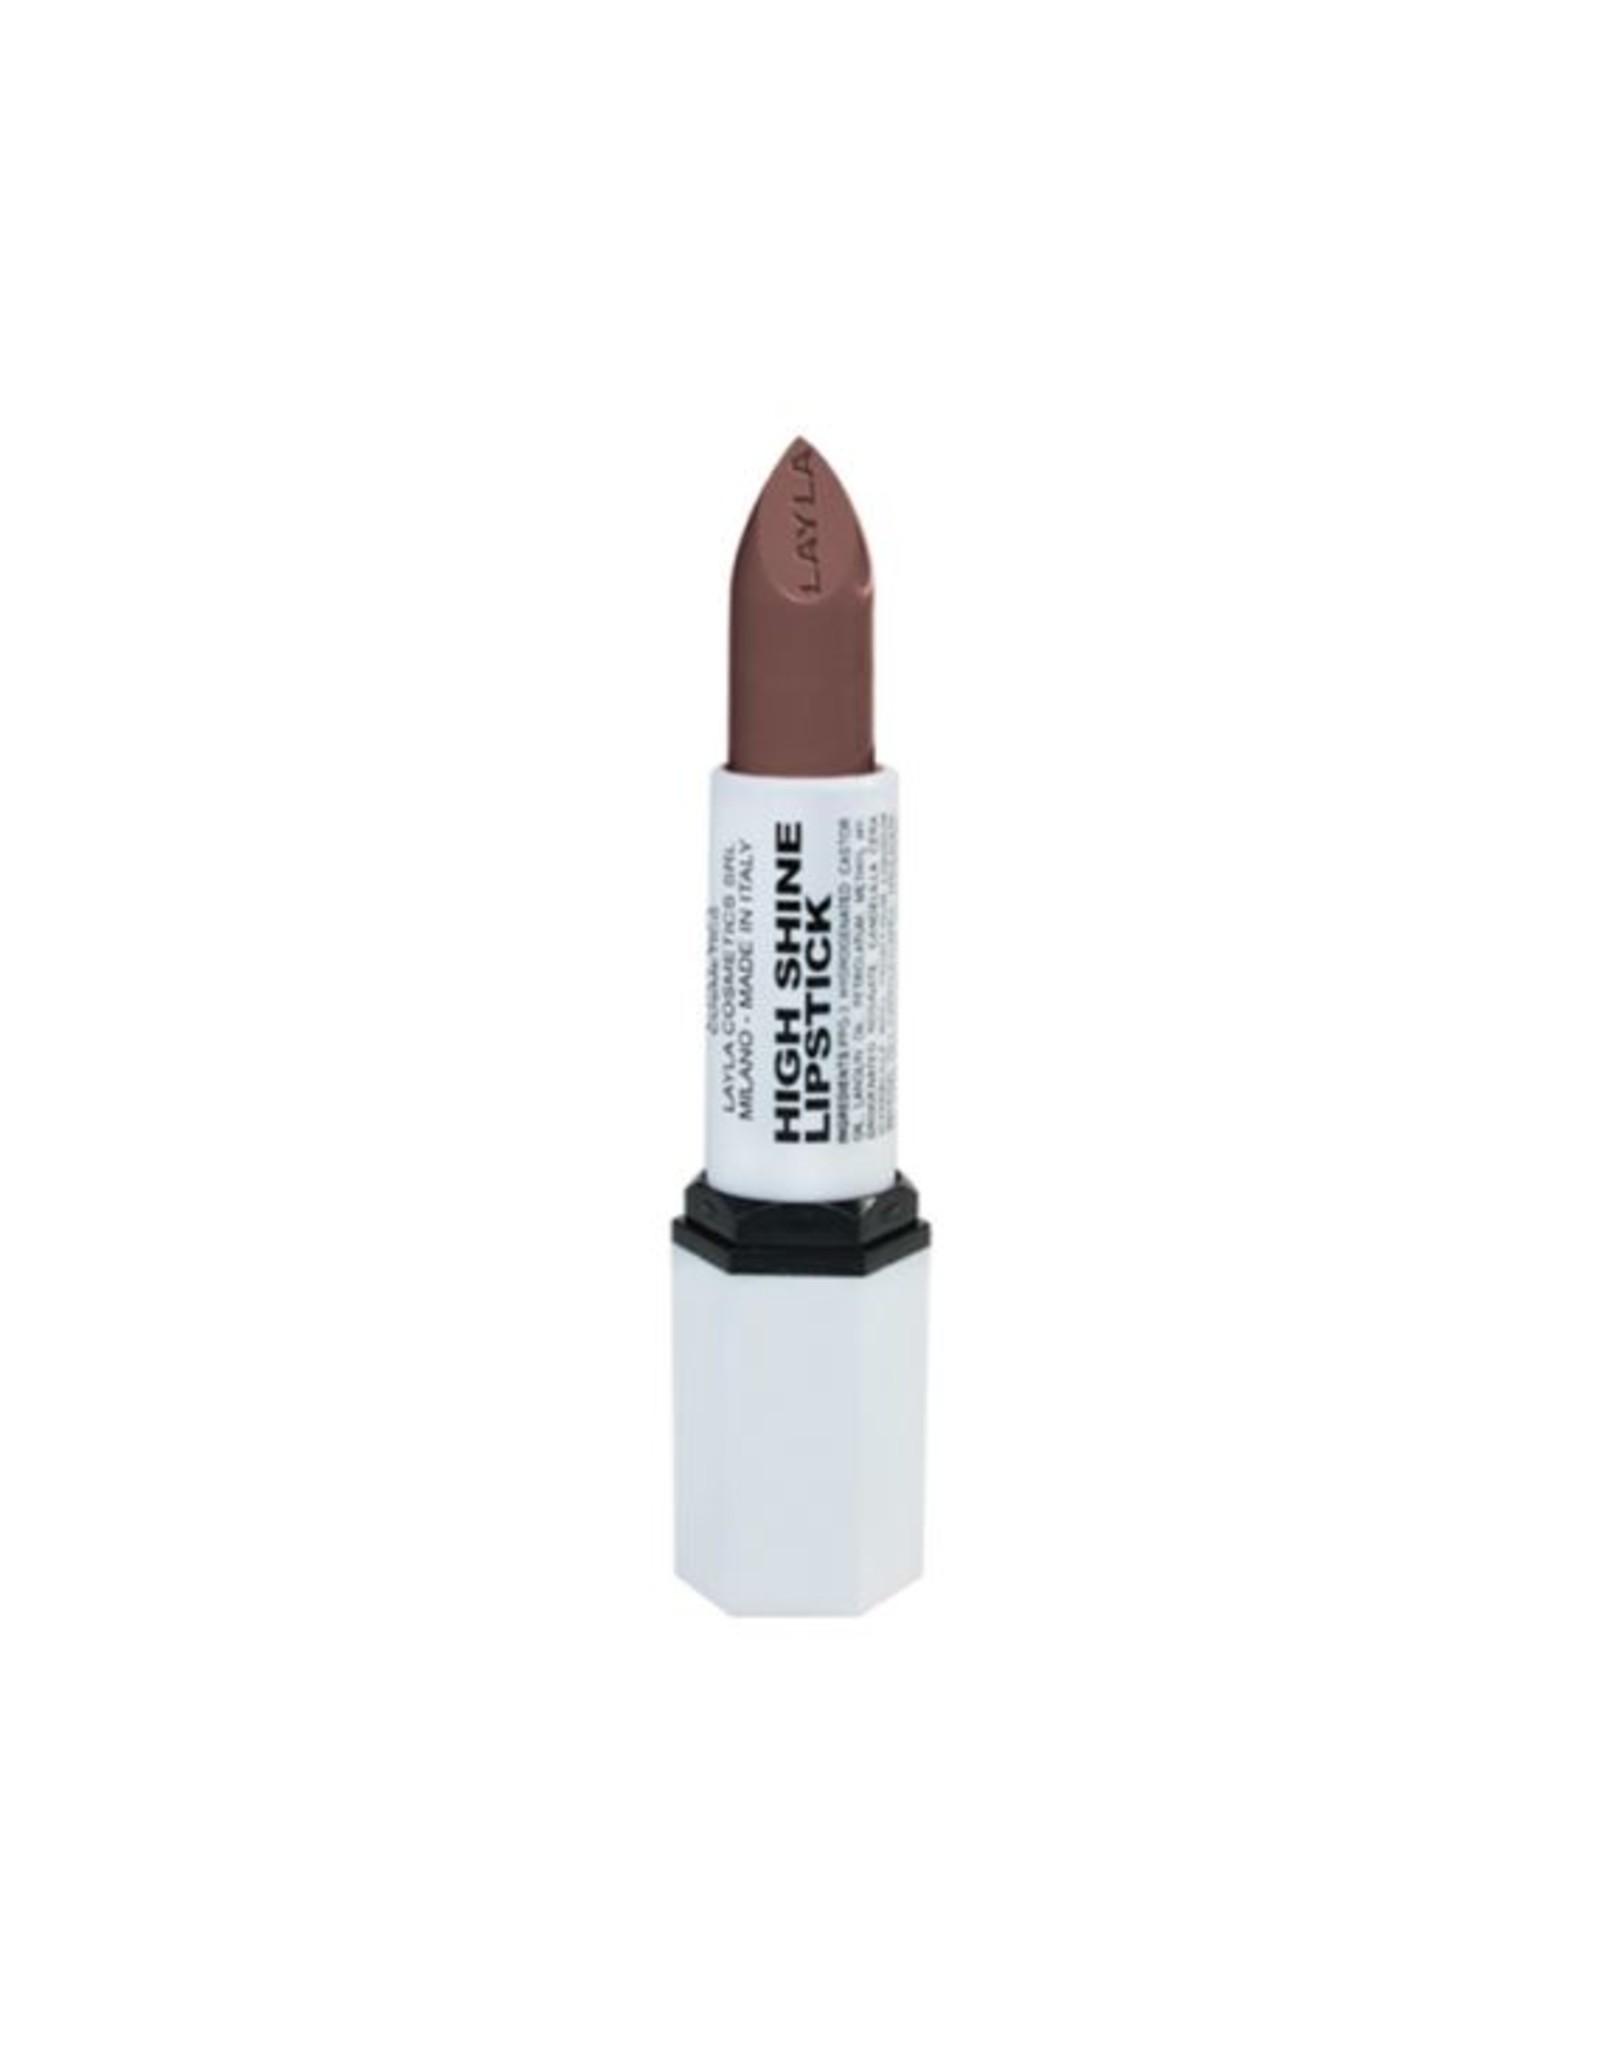 Layla Cosmetics Rouge à Lèvres 38 - High Shine Lipstick - Layla Cosmetics